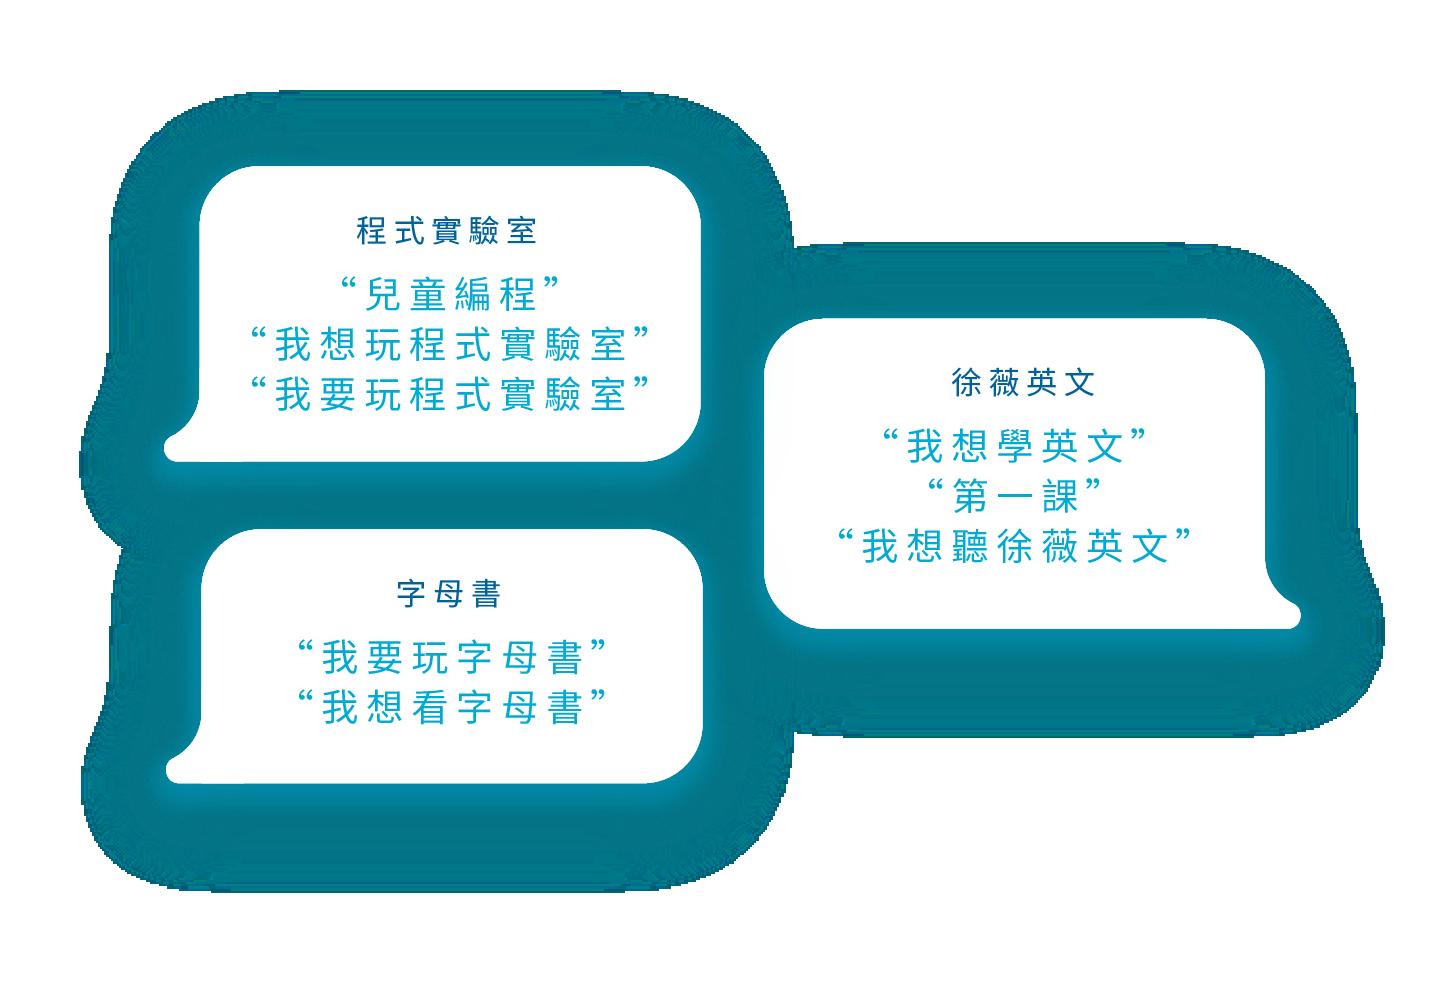 Kebbi_TW_語音指令圖示_Commends_04_Learning.png